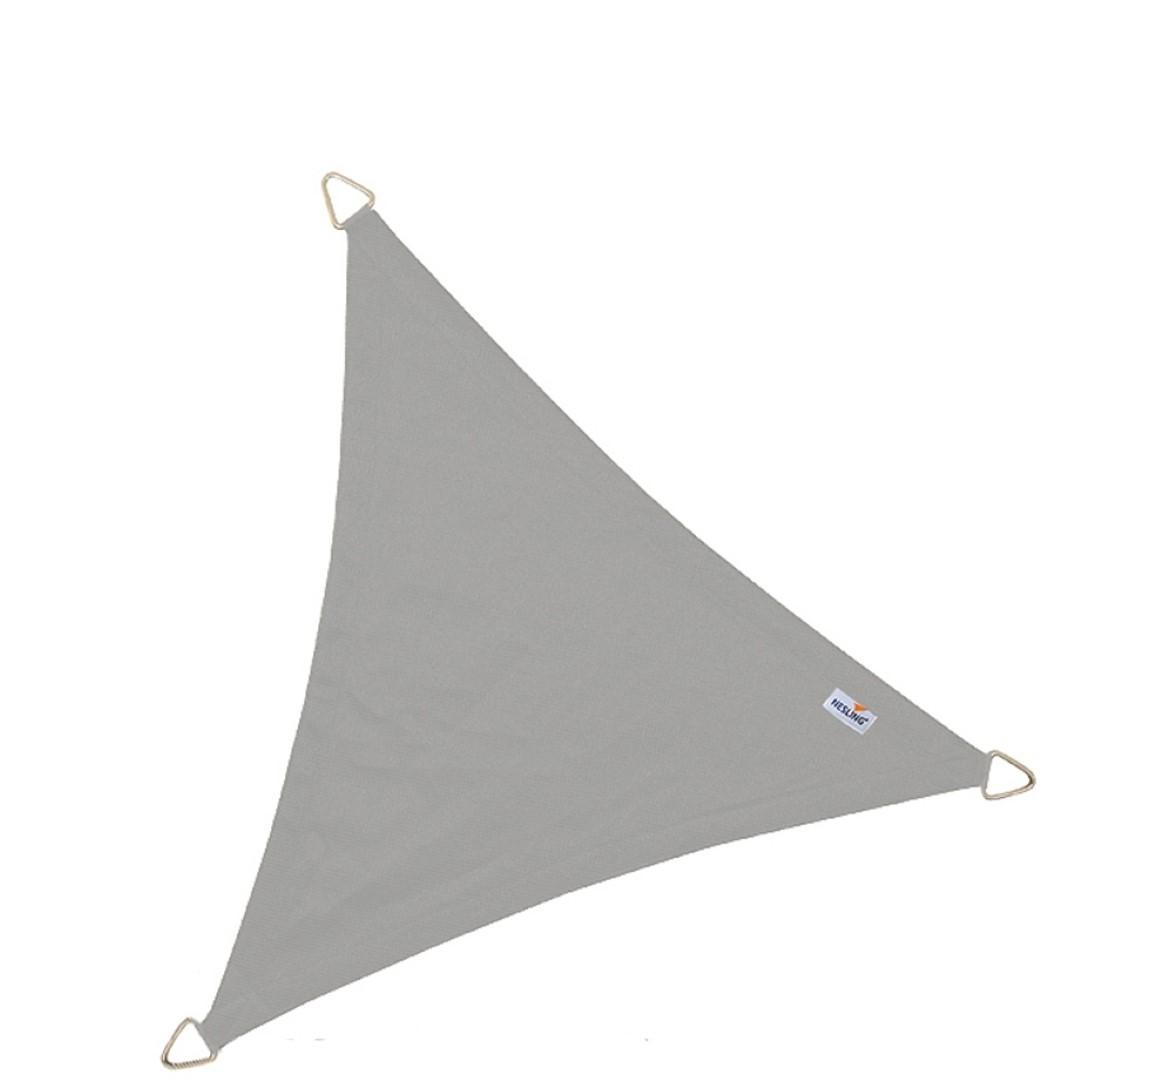 Driehoek 4,0 x 4,0 x 4,0m, Grijs